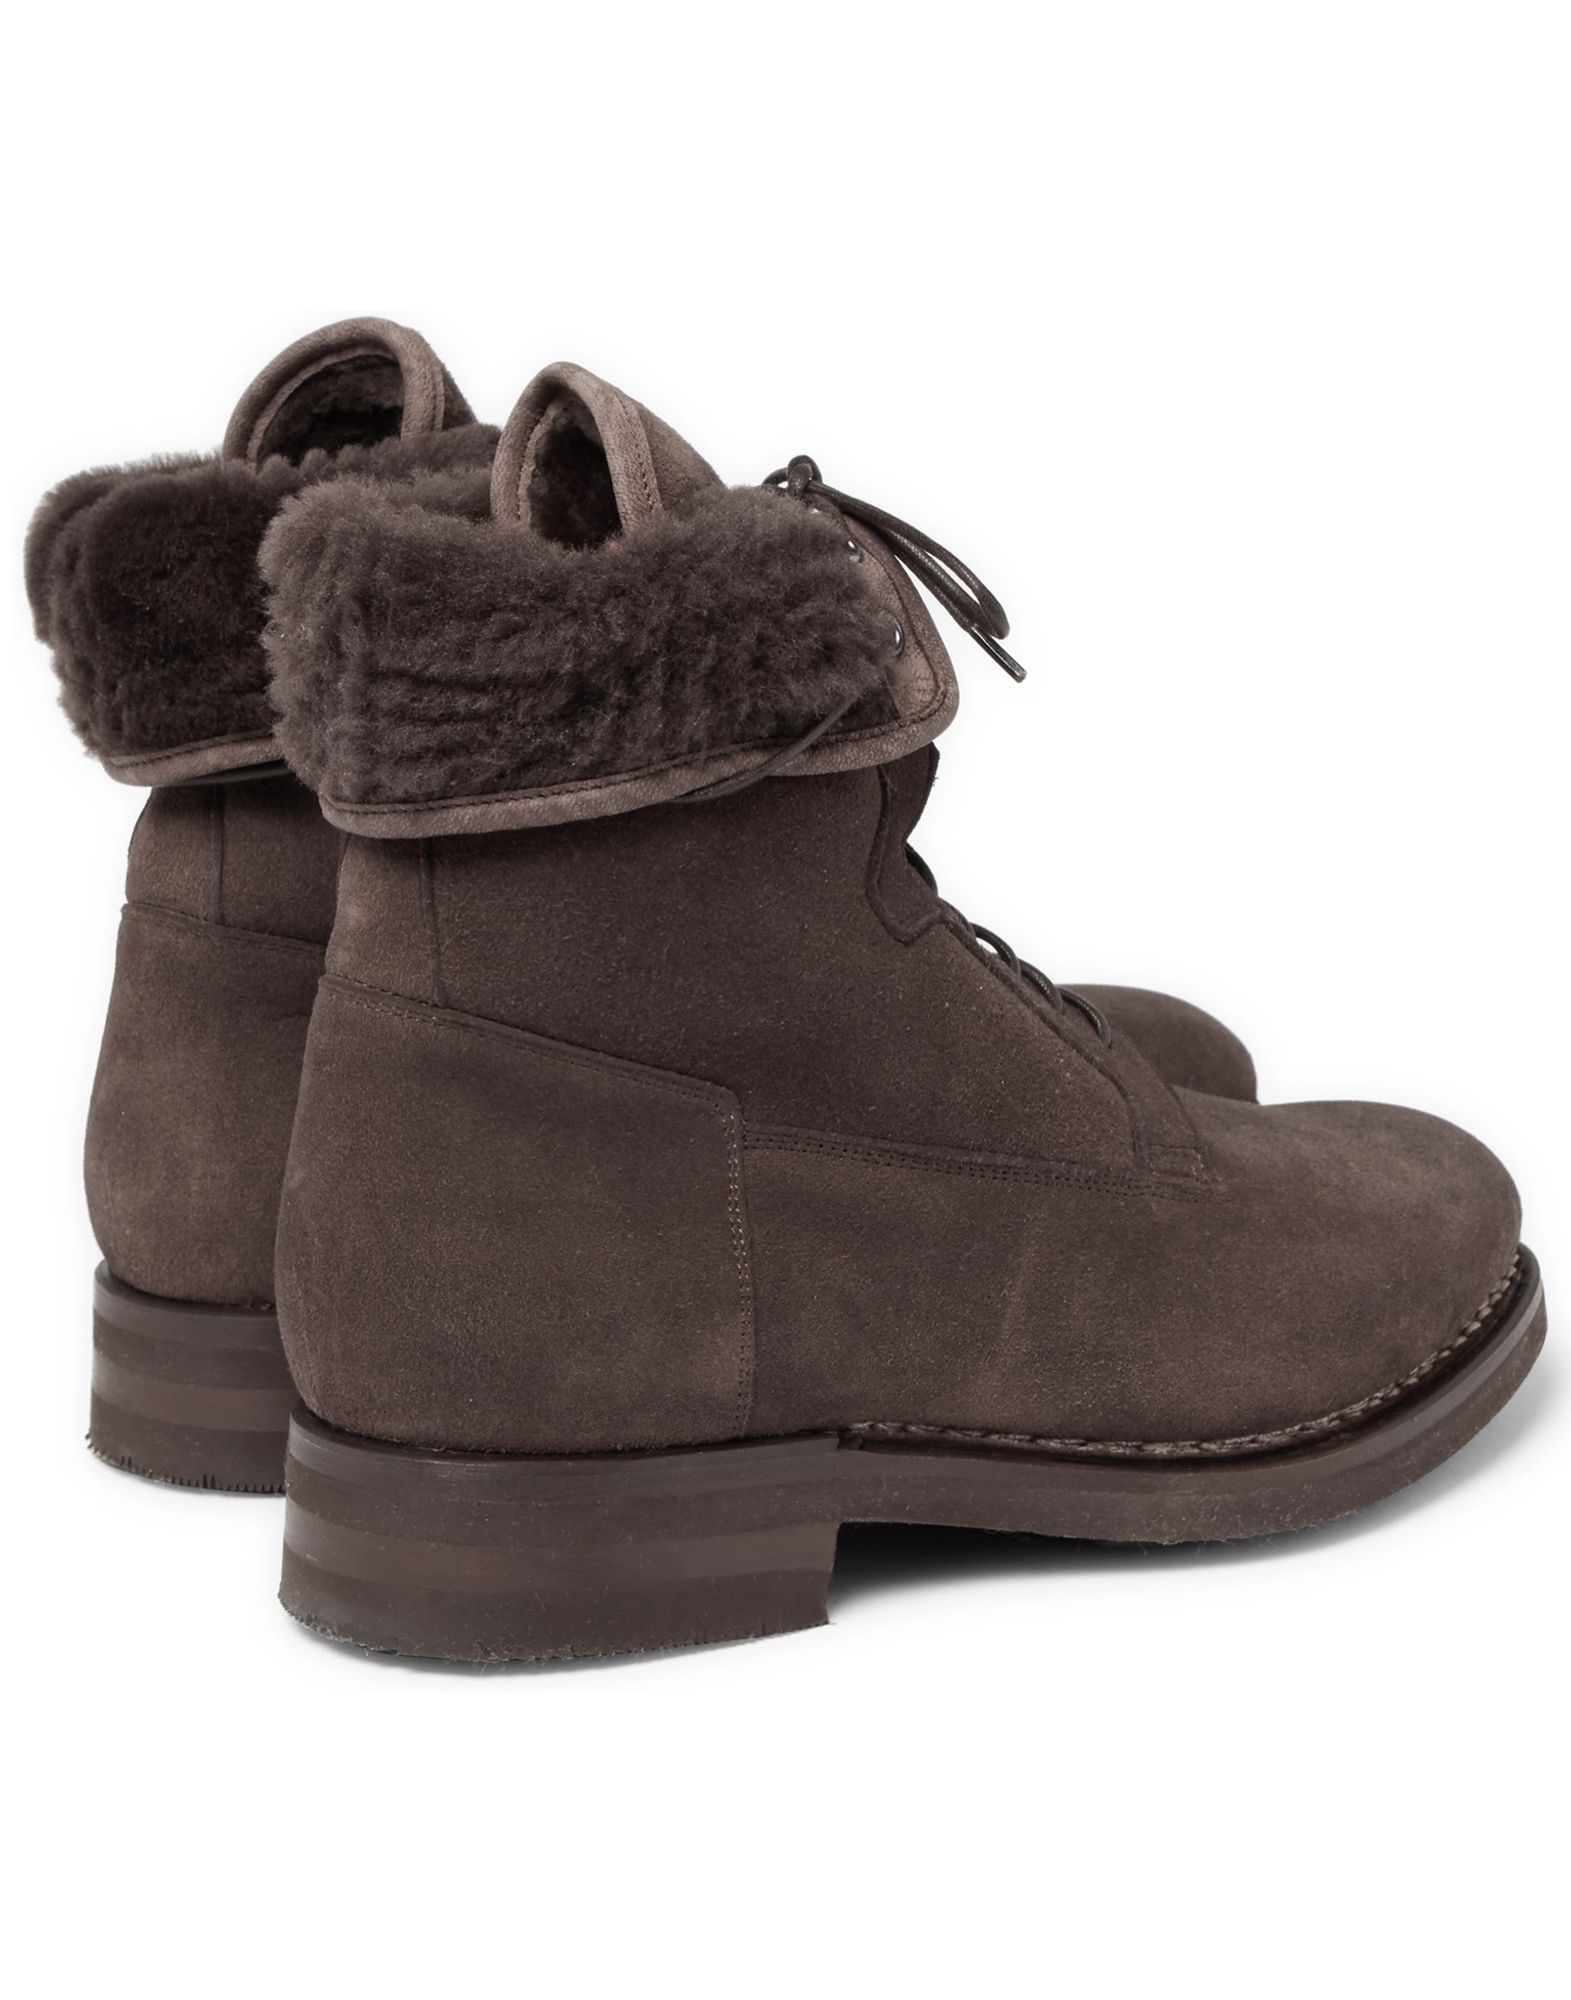 Santoni Boots - - - Men Santoni Boots online on  Australia - 11540735KB d5bd21